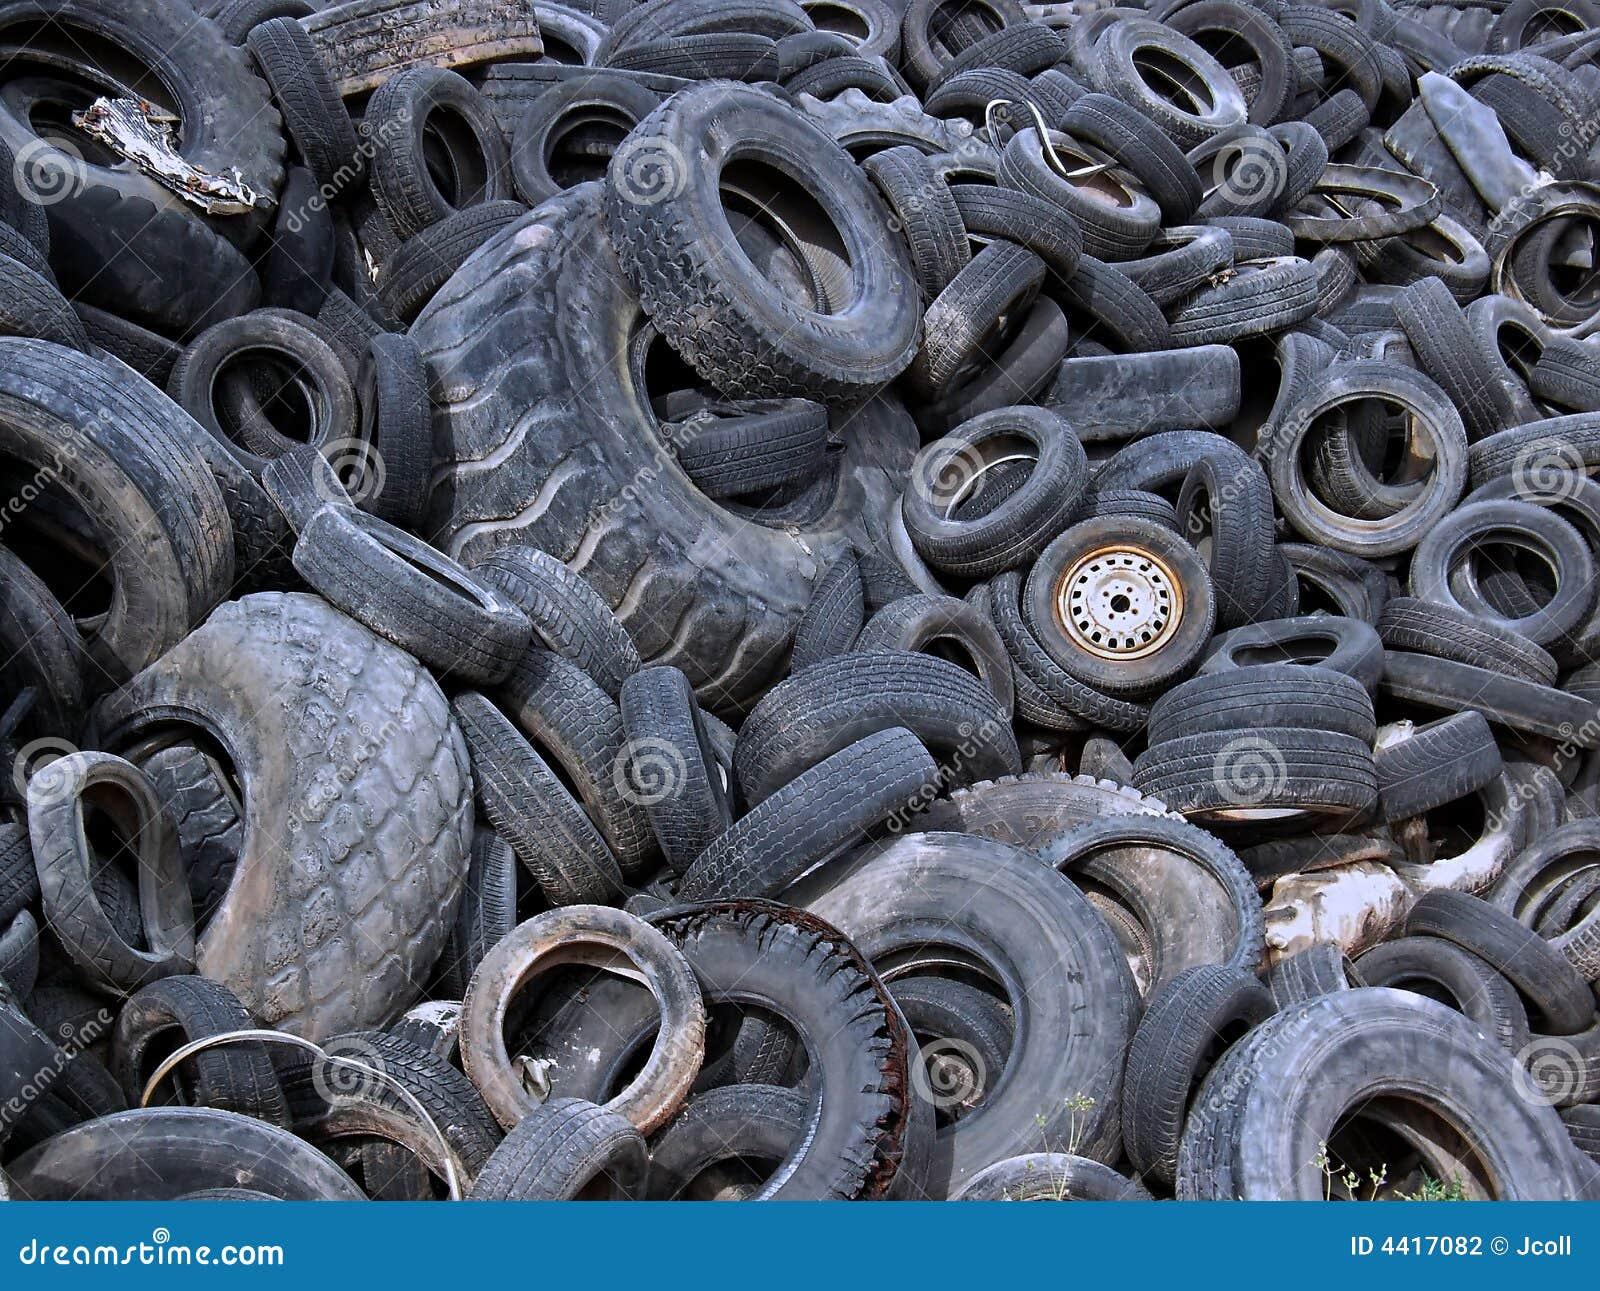 Tire Dump 2 Stock Photography Image 4417082